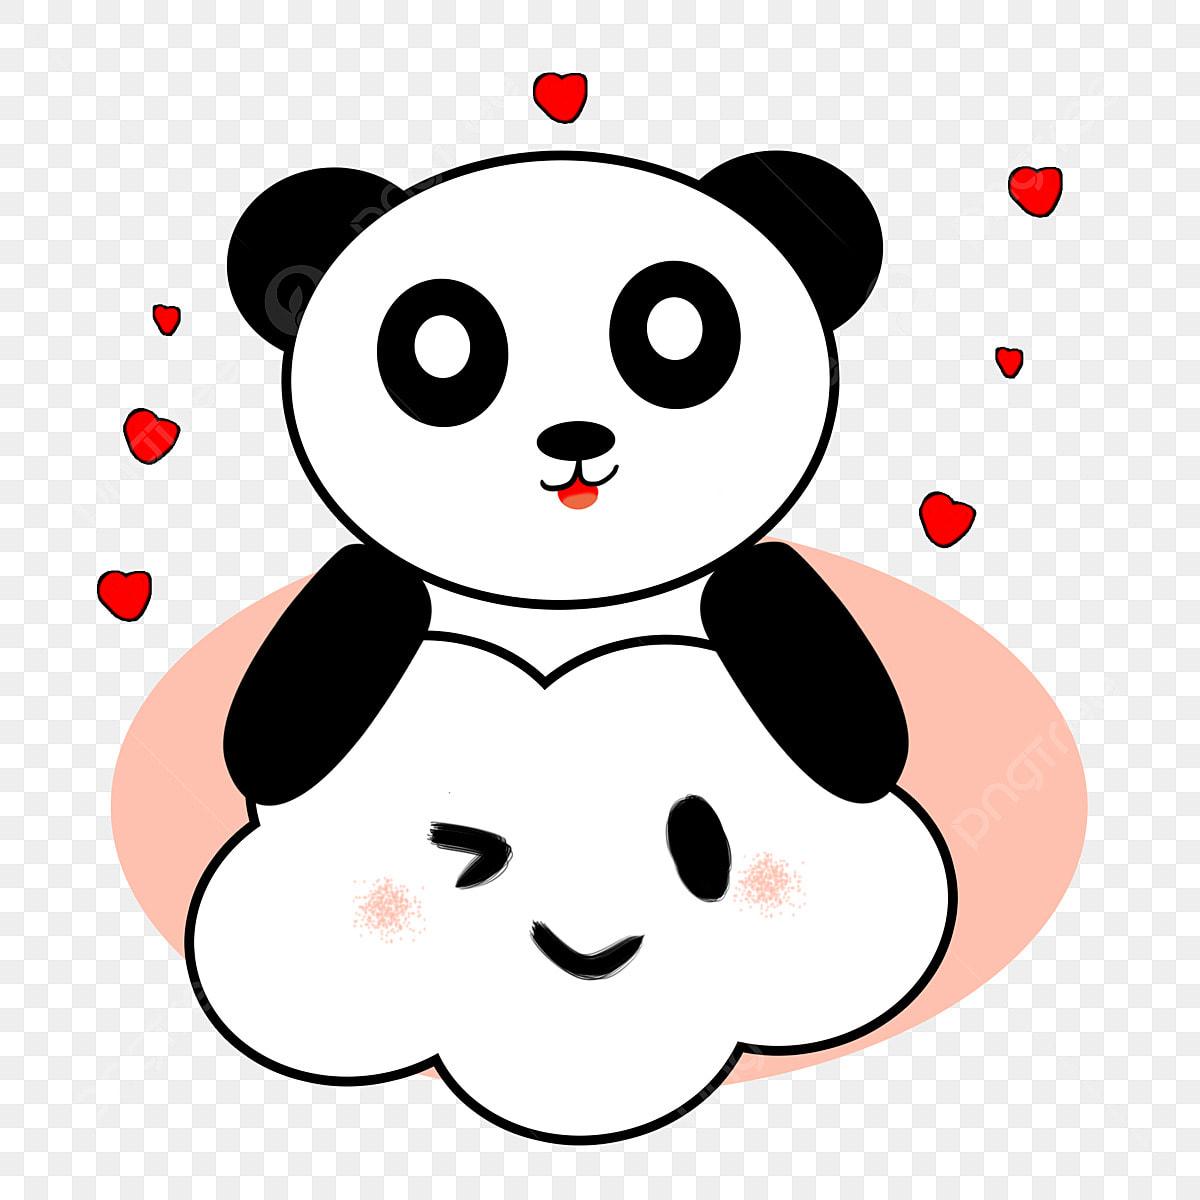 Cute Cartoon Clouds And Panda Clouds Panda Cute PNG